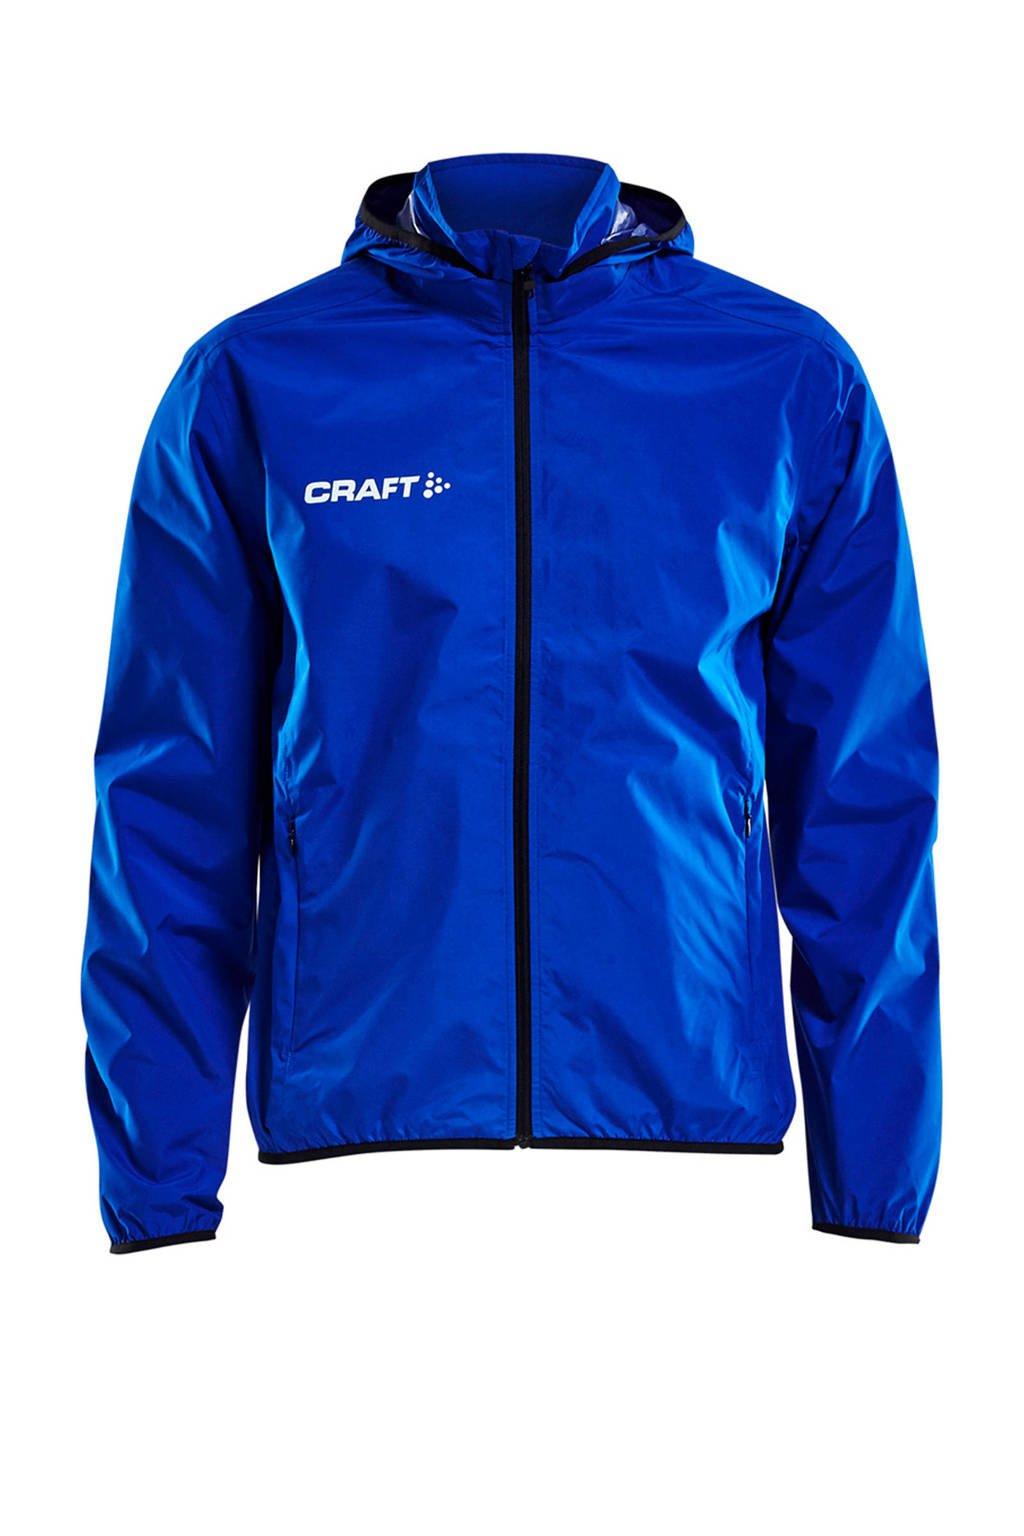 Craft Senior  voetbaljack blauw, Blauw